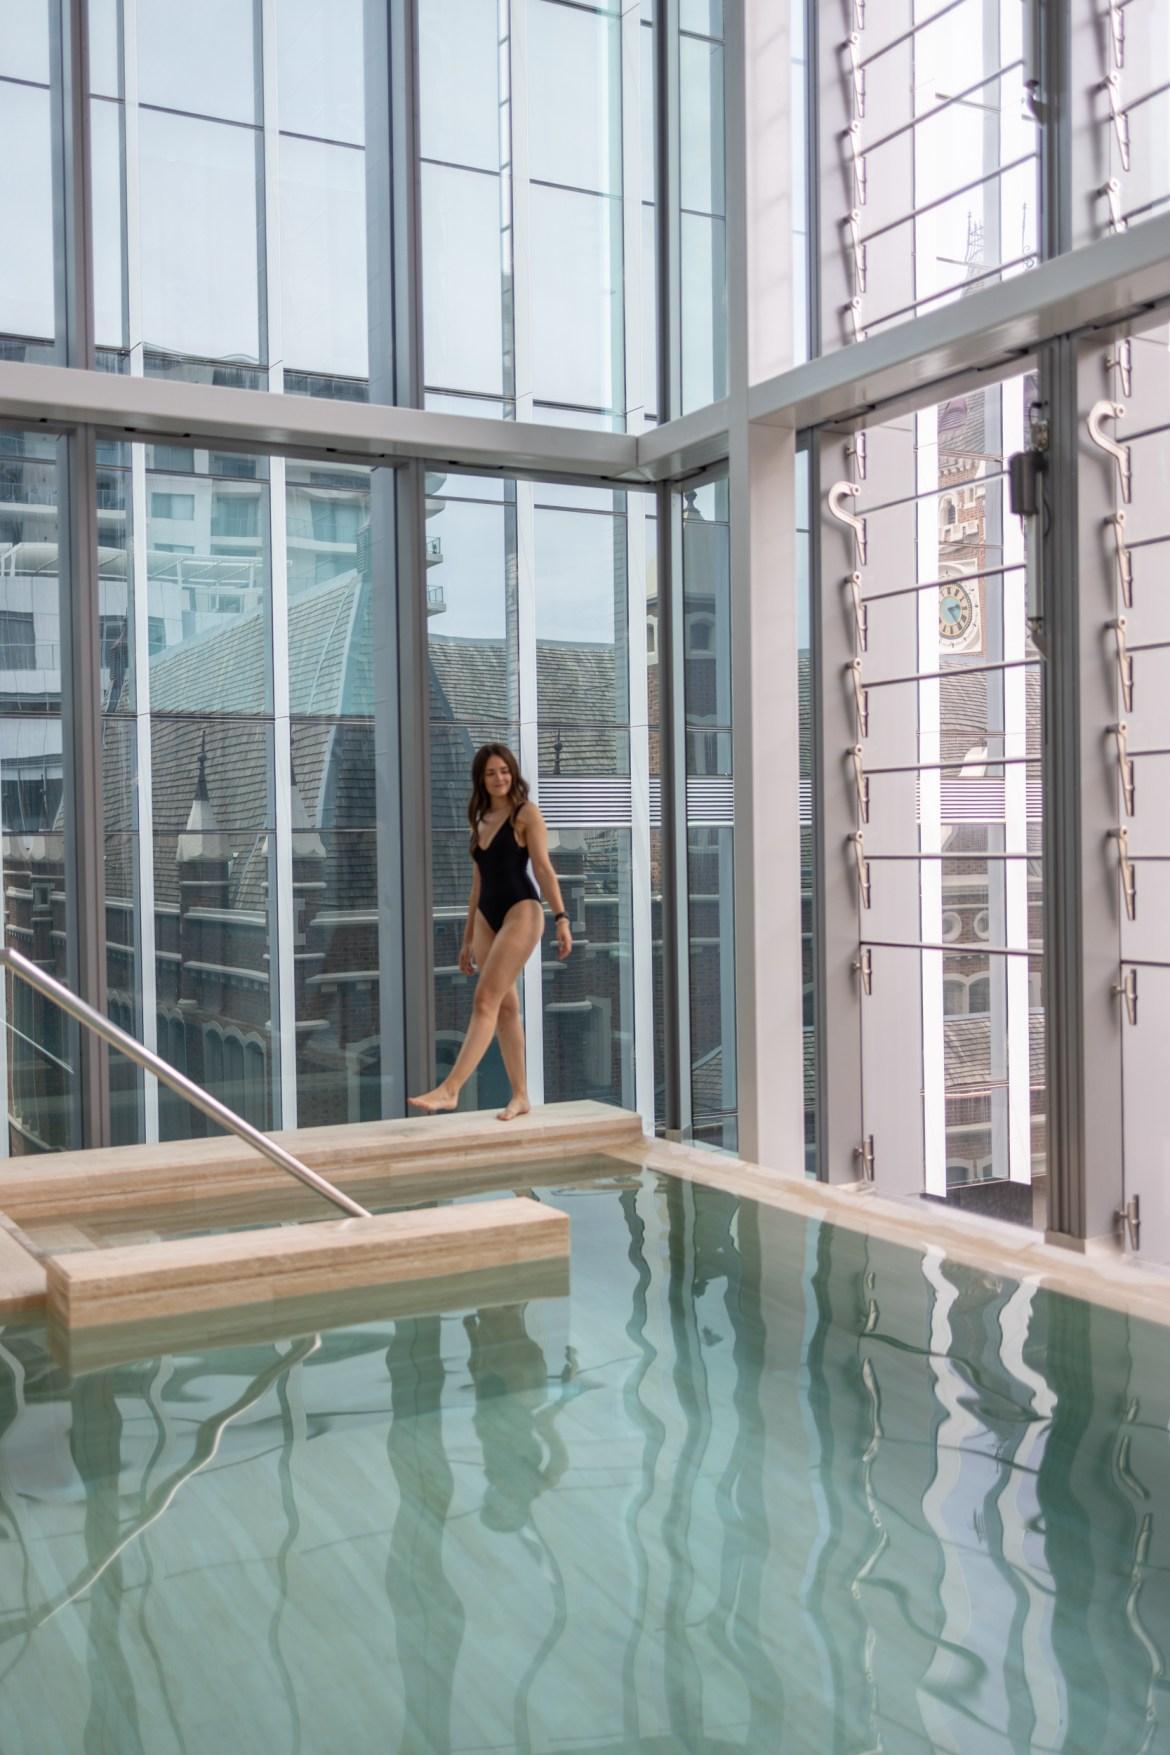 Indoor pool goals at Como the Treasury